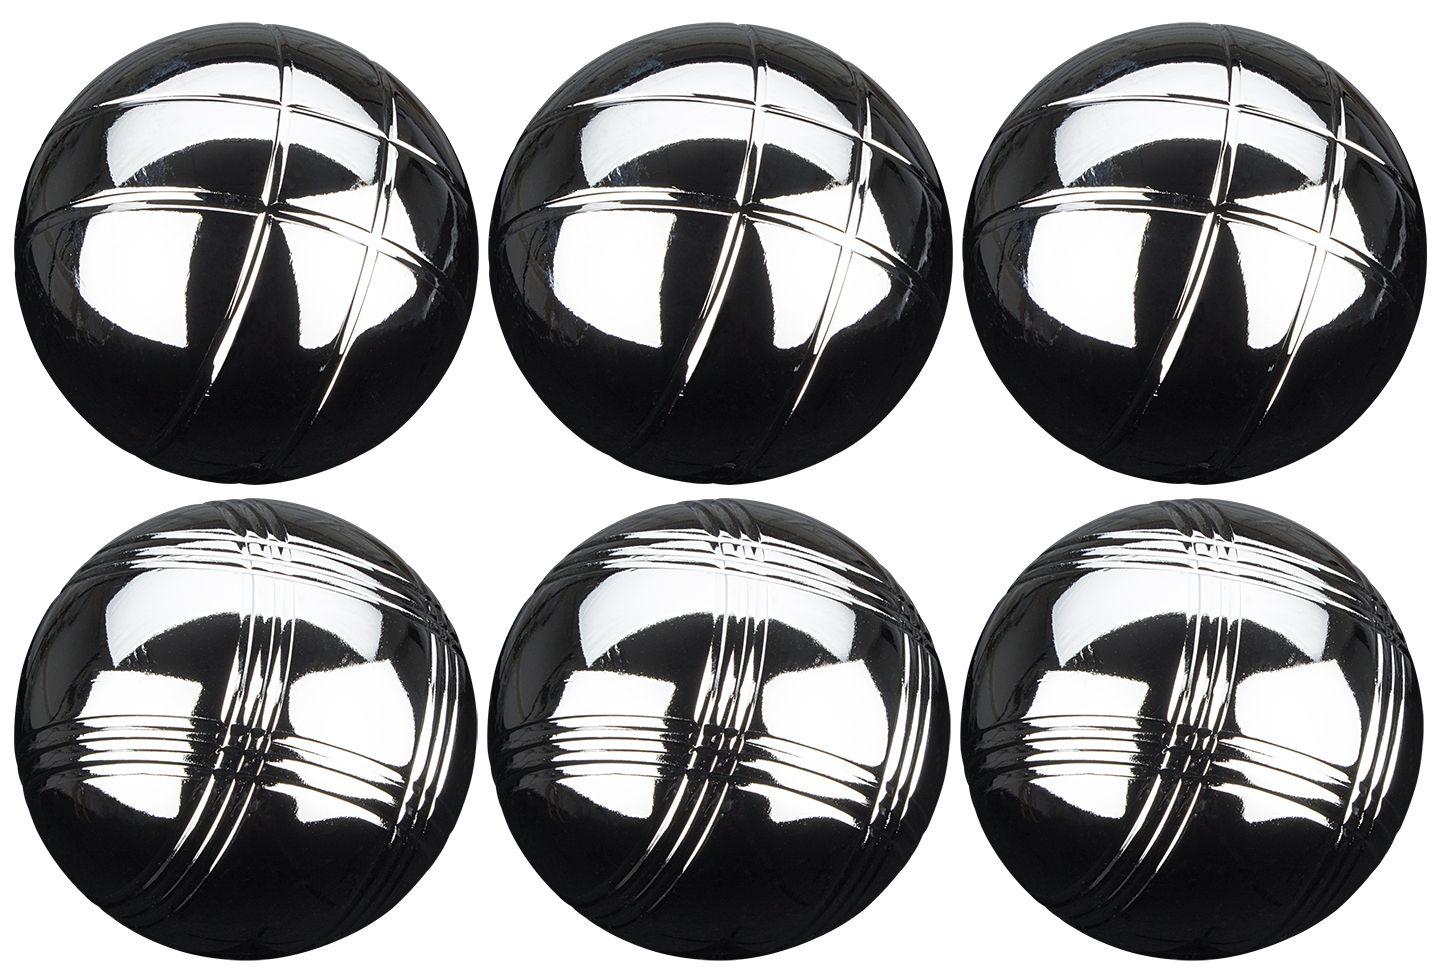 Jeu de Boules Set VI • 6 Ballen •